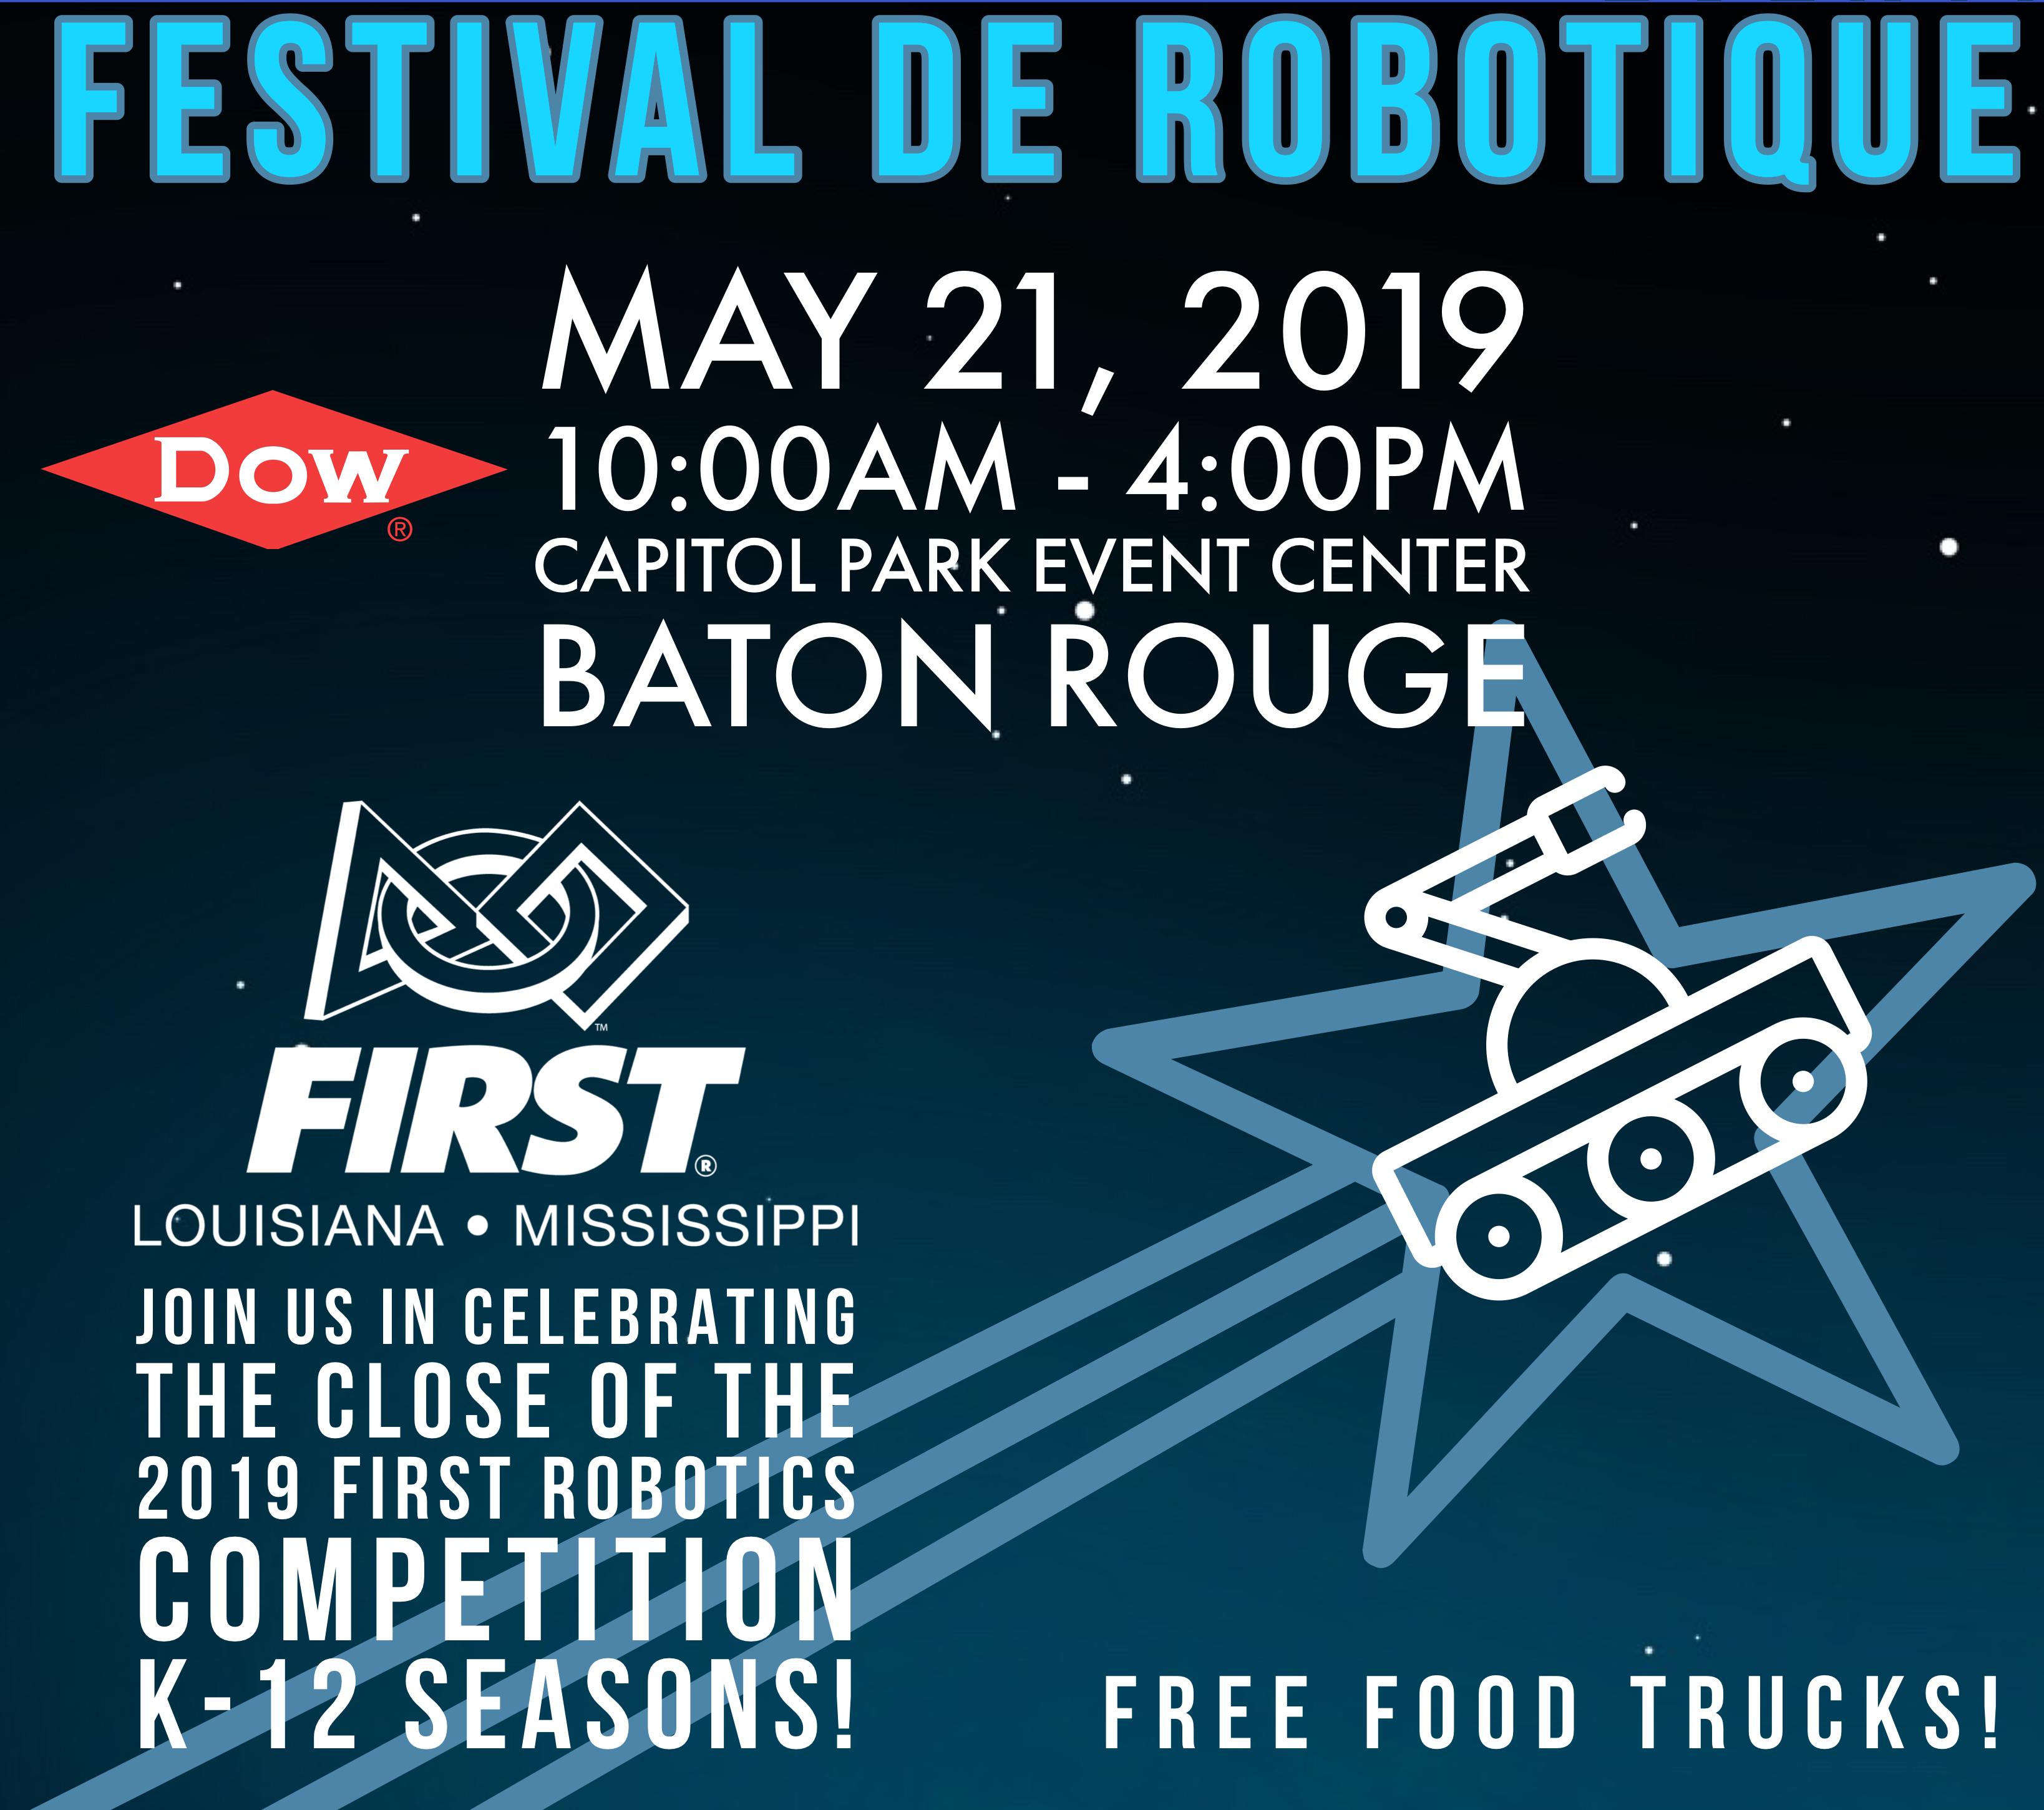 Festival de Robotique